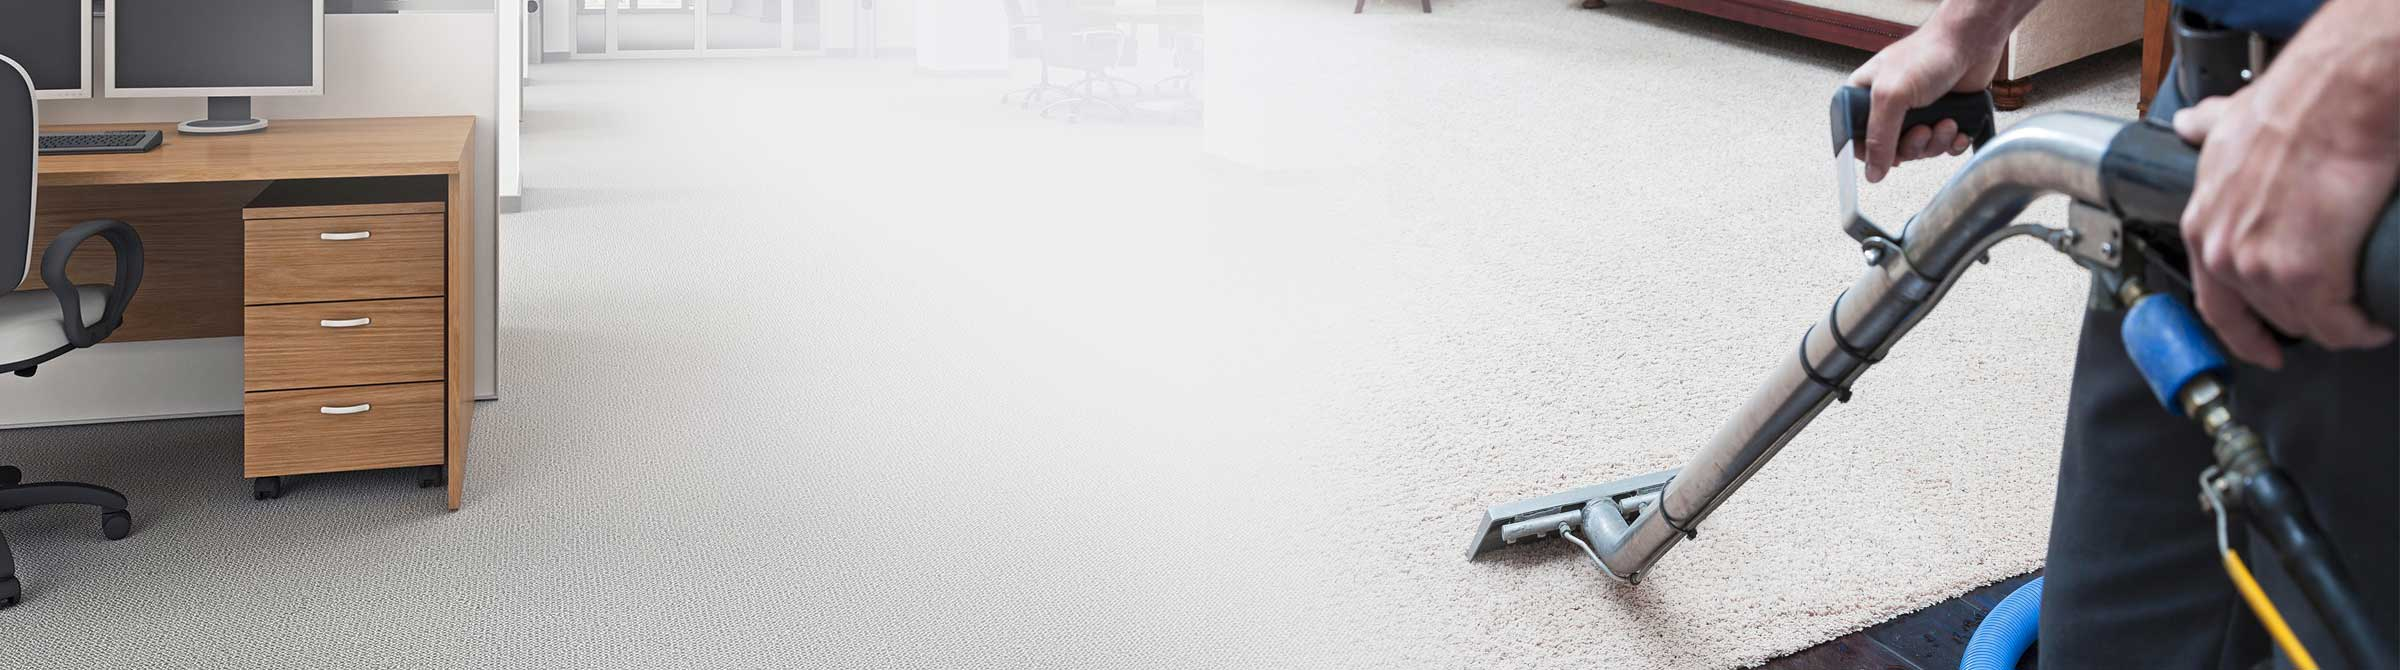 Professional Carpet Cleaning Pensacola FL